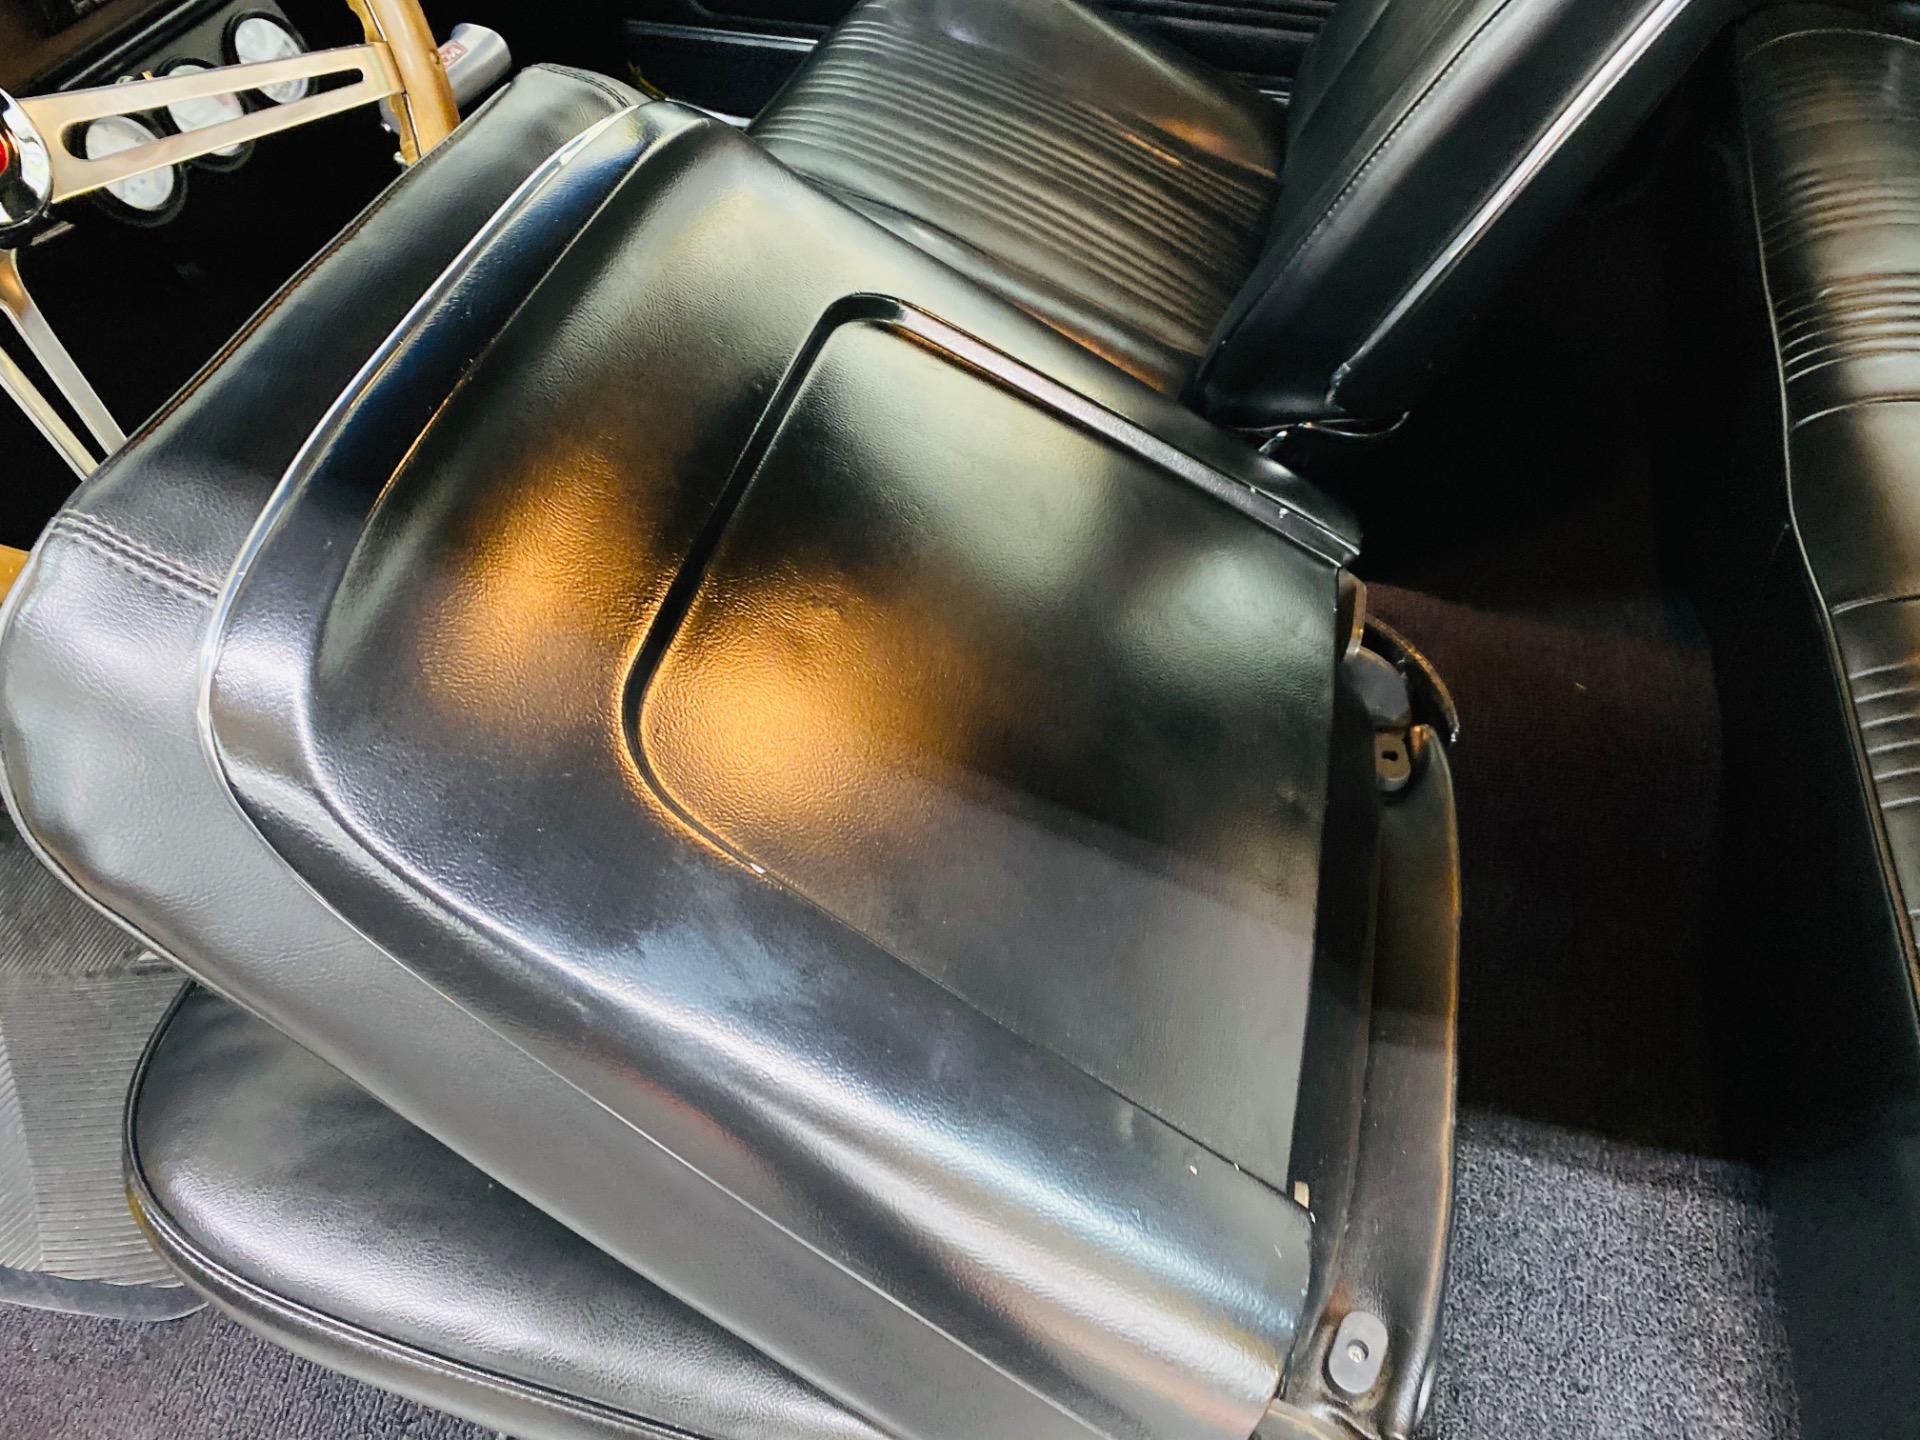 Used 1967 Pontiac GTO -CUSTOM BUILT MUSCLE - 455 ENGINE - SEE VIDEO | Mundelein, IL